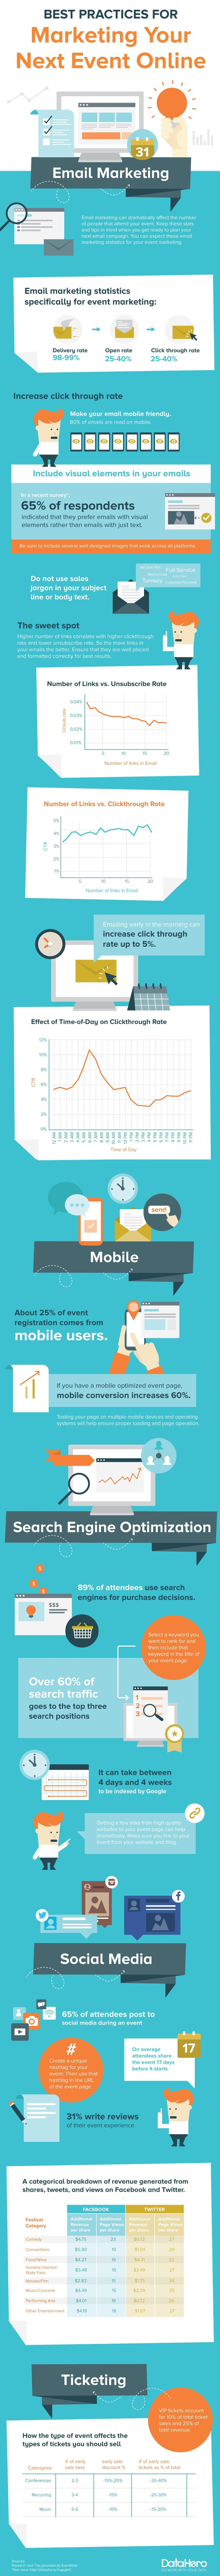 event-marketing-online-infographic.jpg